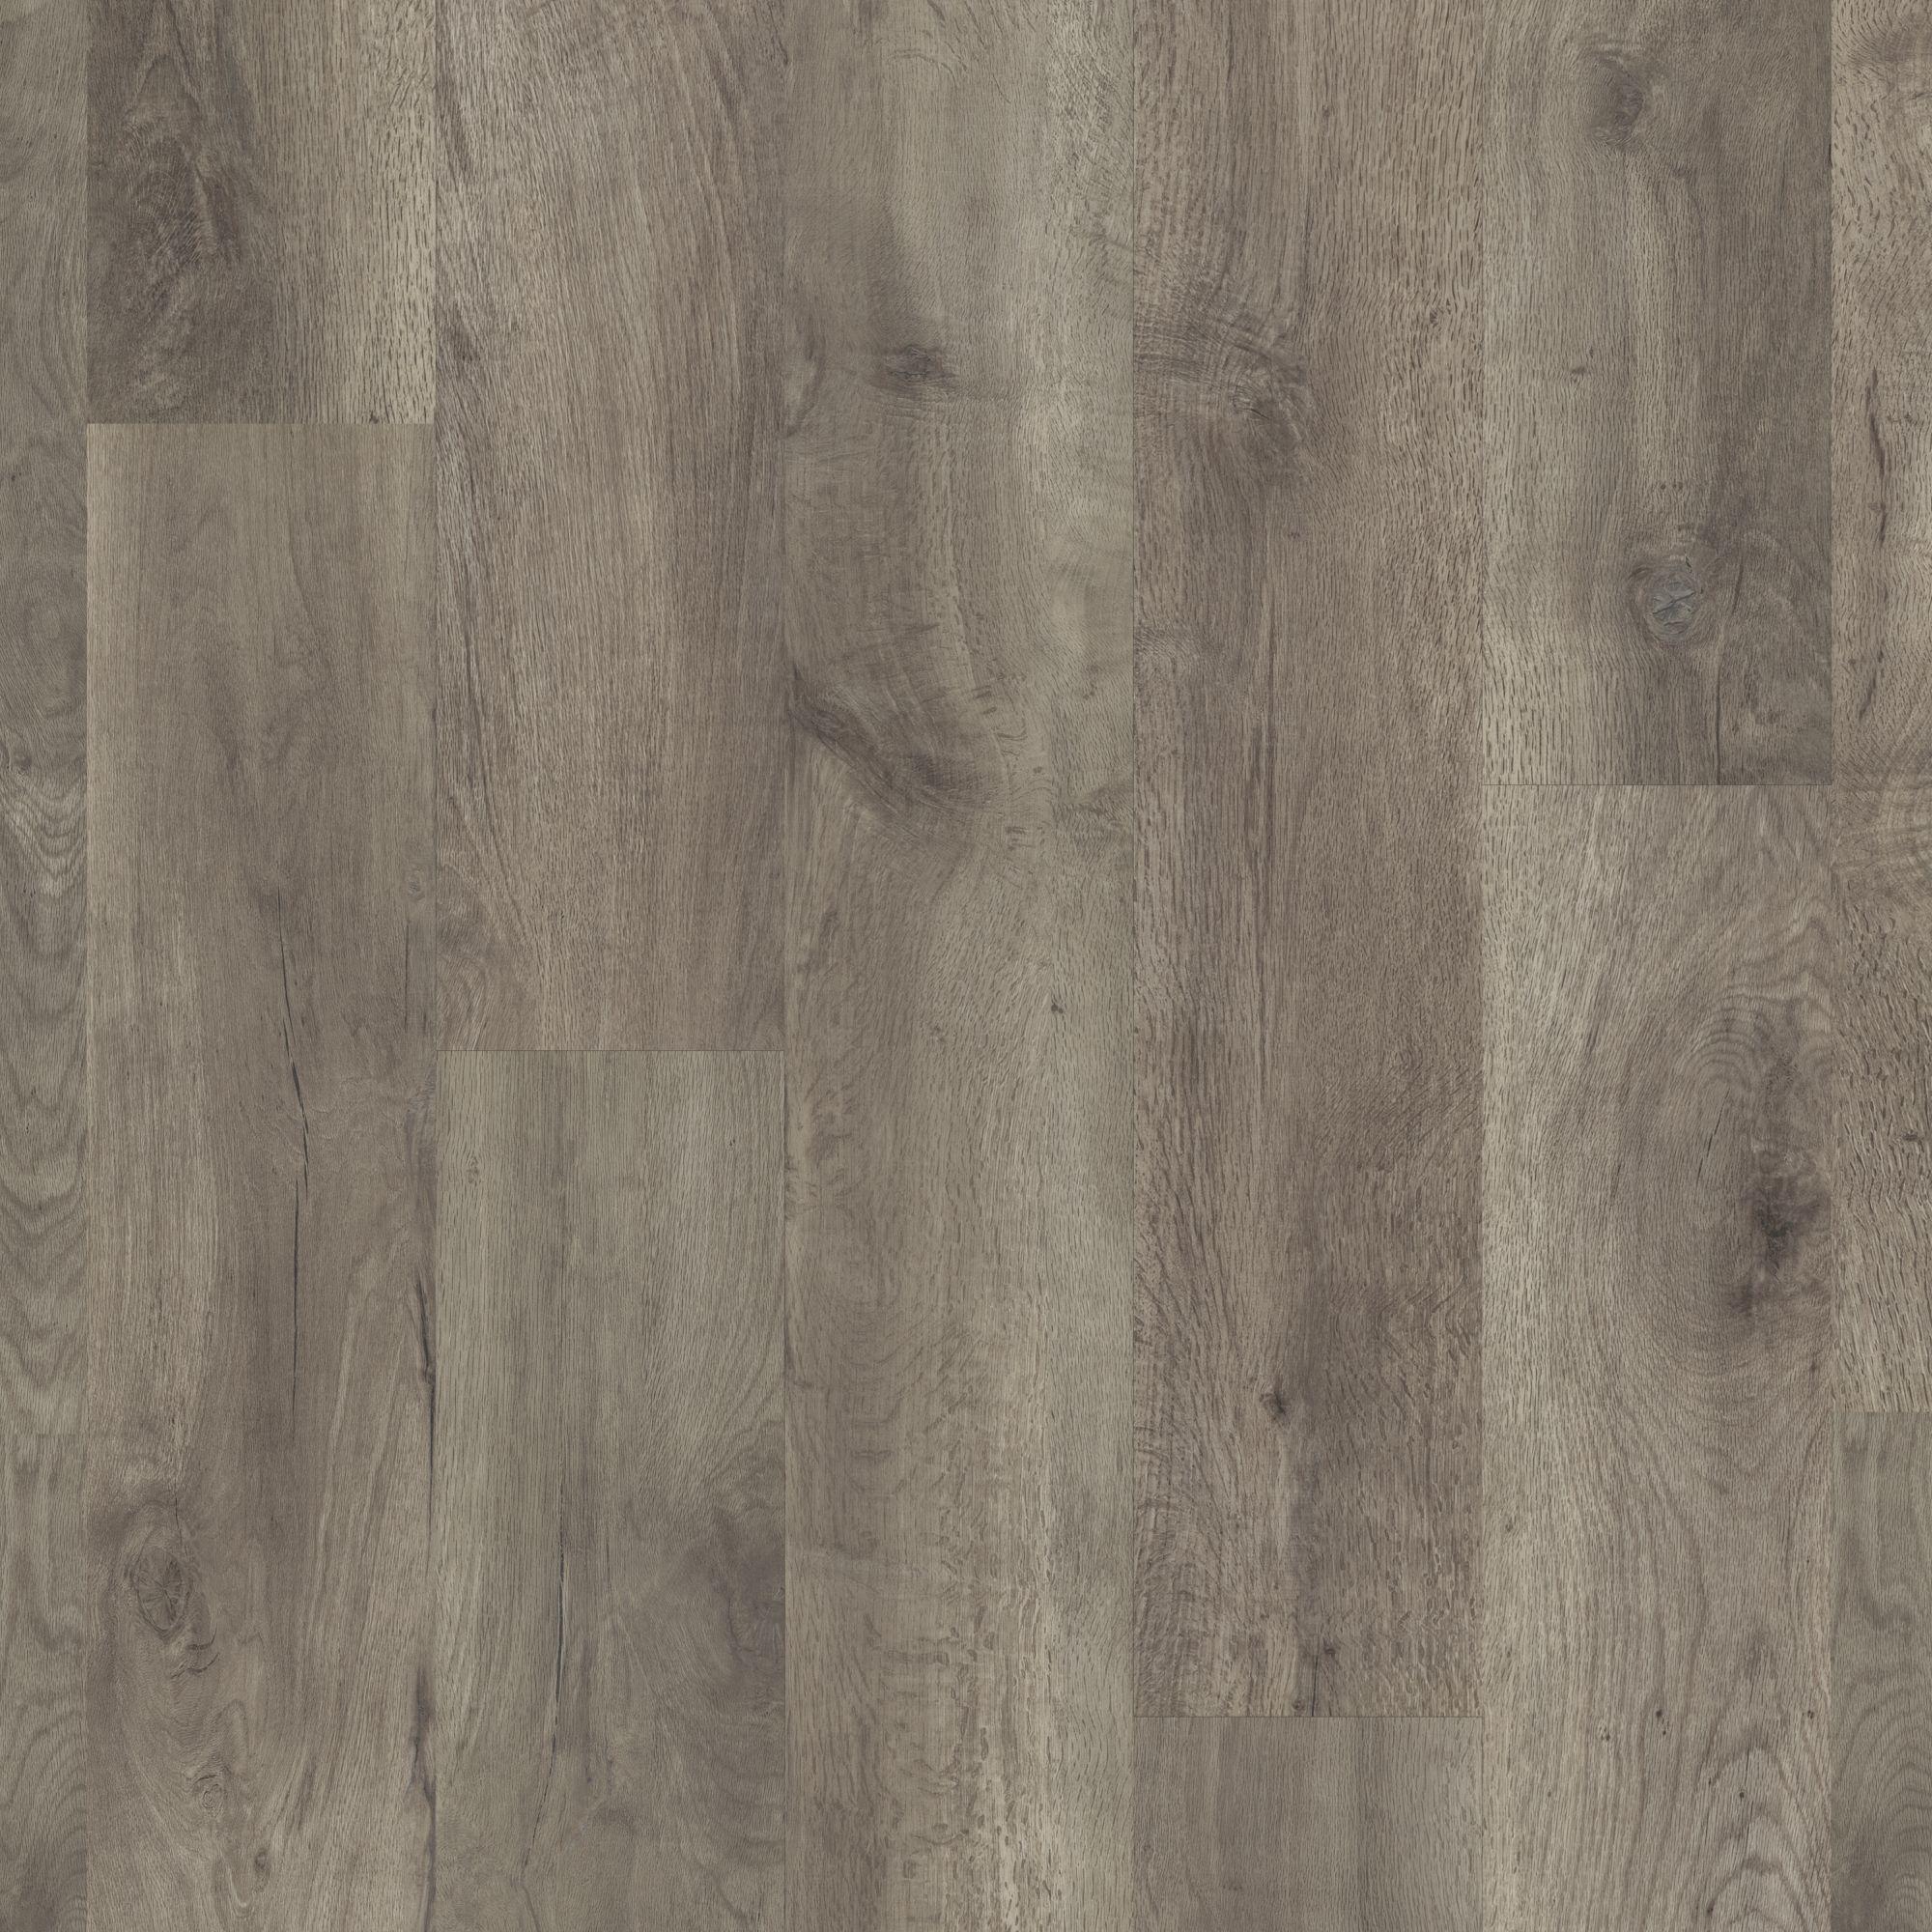 Karndean Karndean Art Select Wood Flooring, Storm Oak